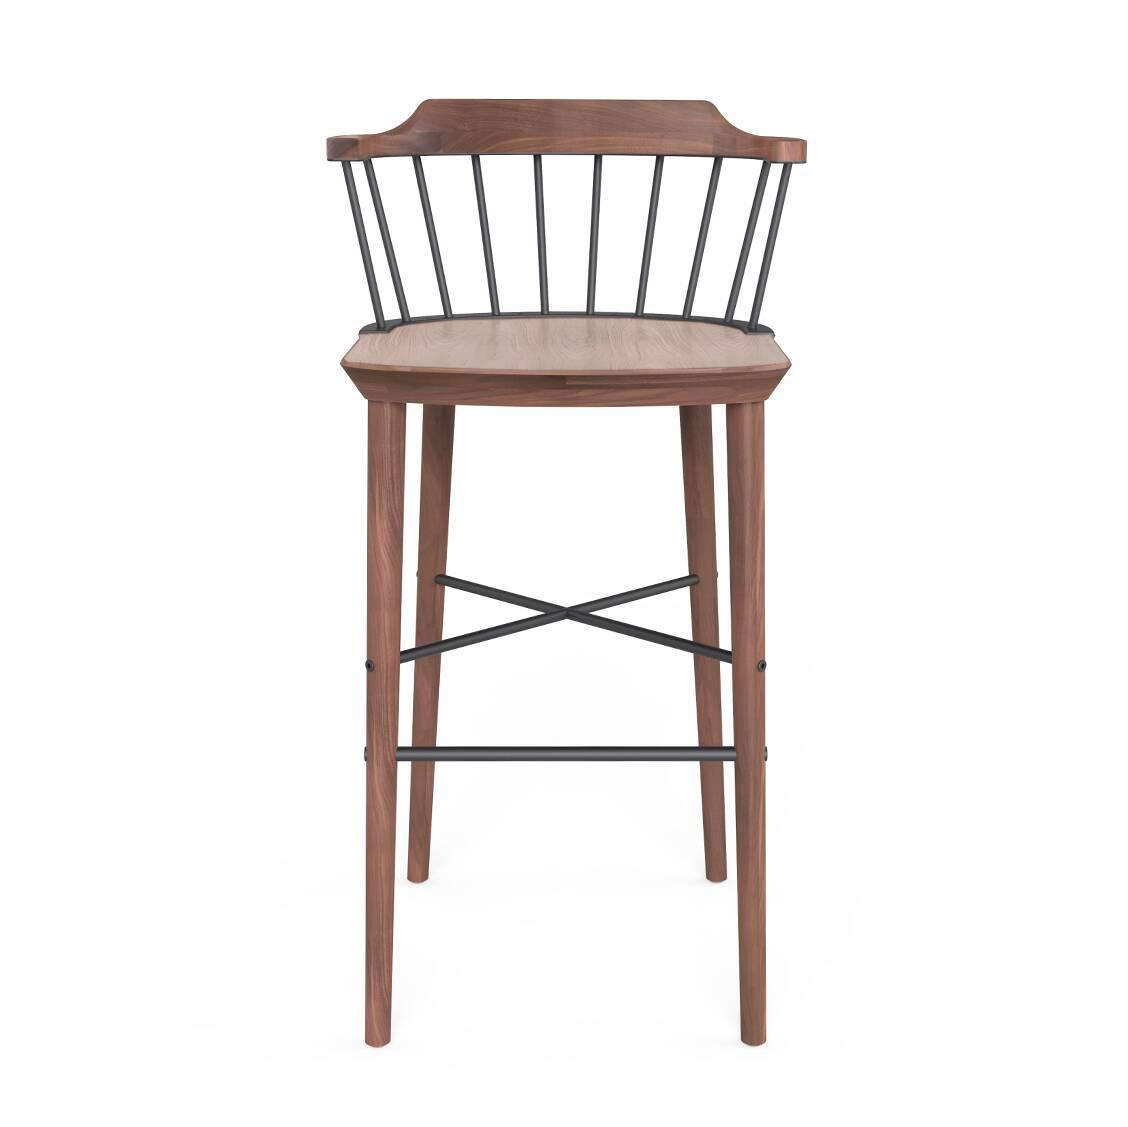 Барный стул Stellar works 15576775 от Cosmorelax